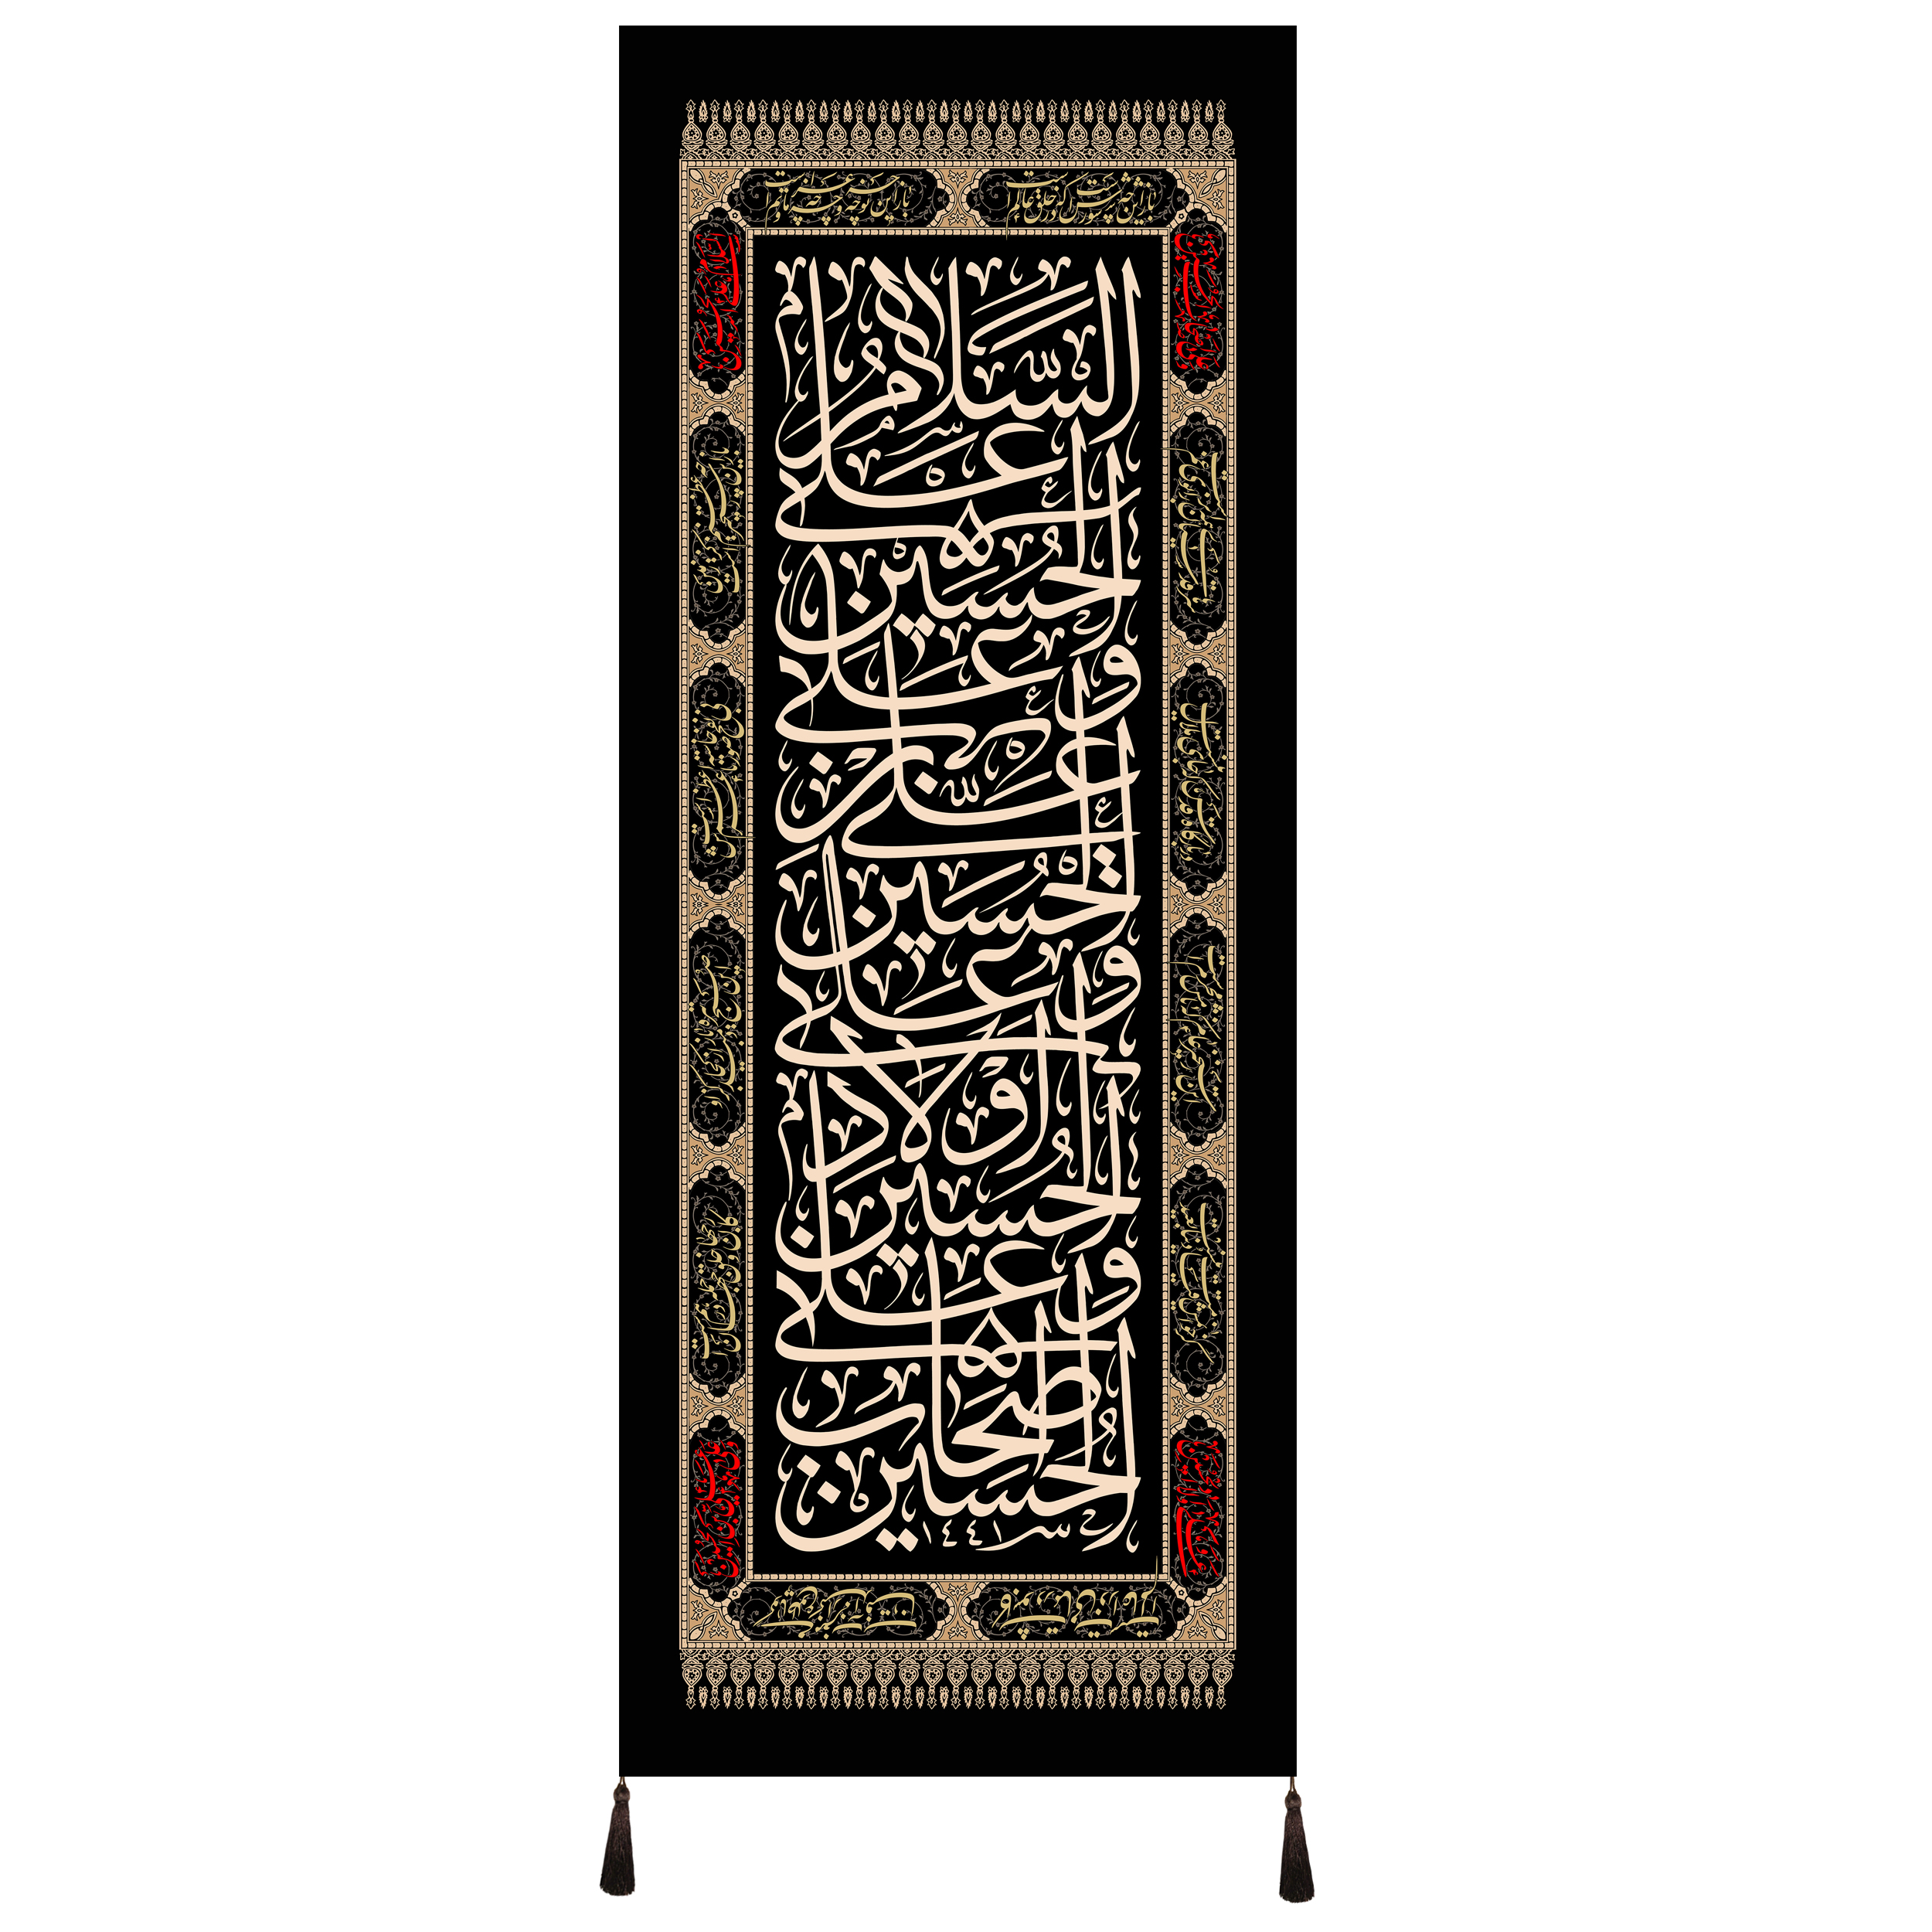 خرید                      پرچم طرح امام حسین علیه السلام کد 11114